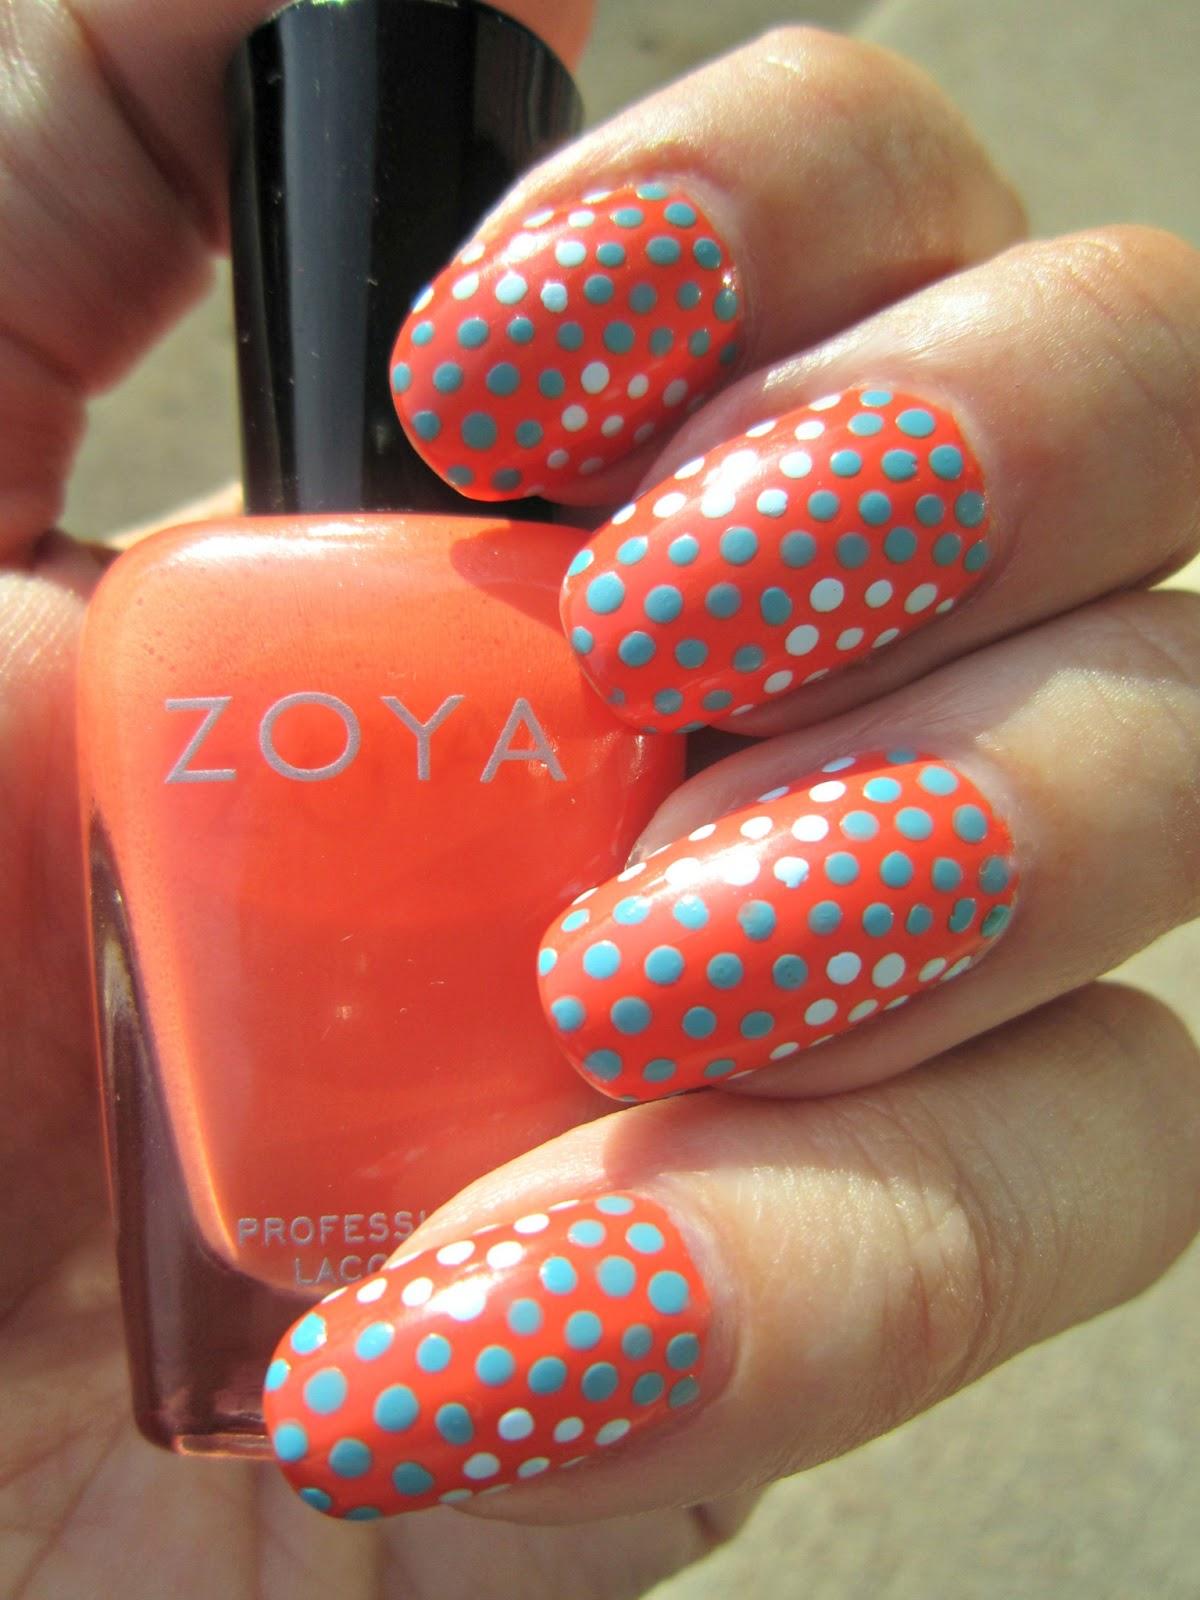 Tool nail designs further nail art dotting tool in addition nail art